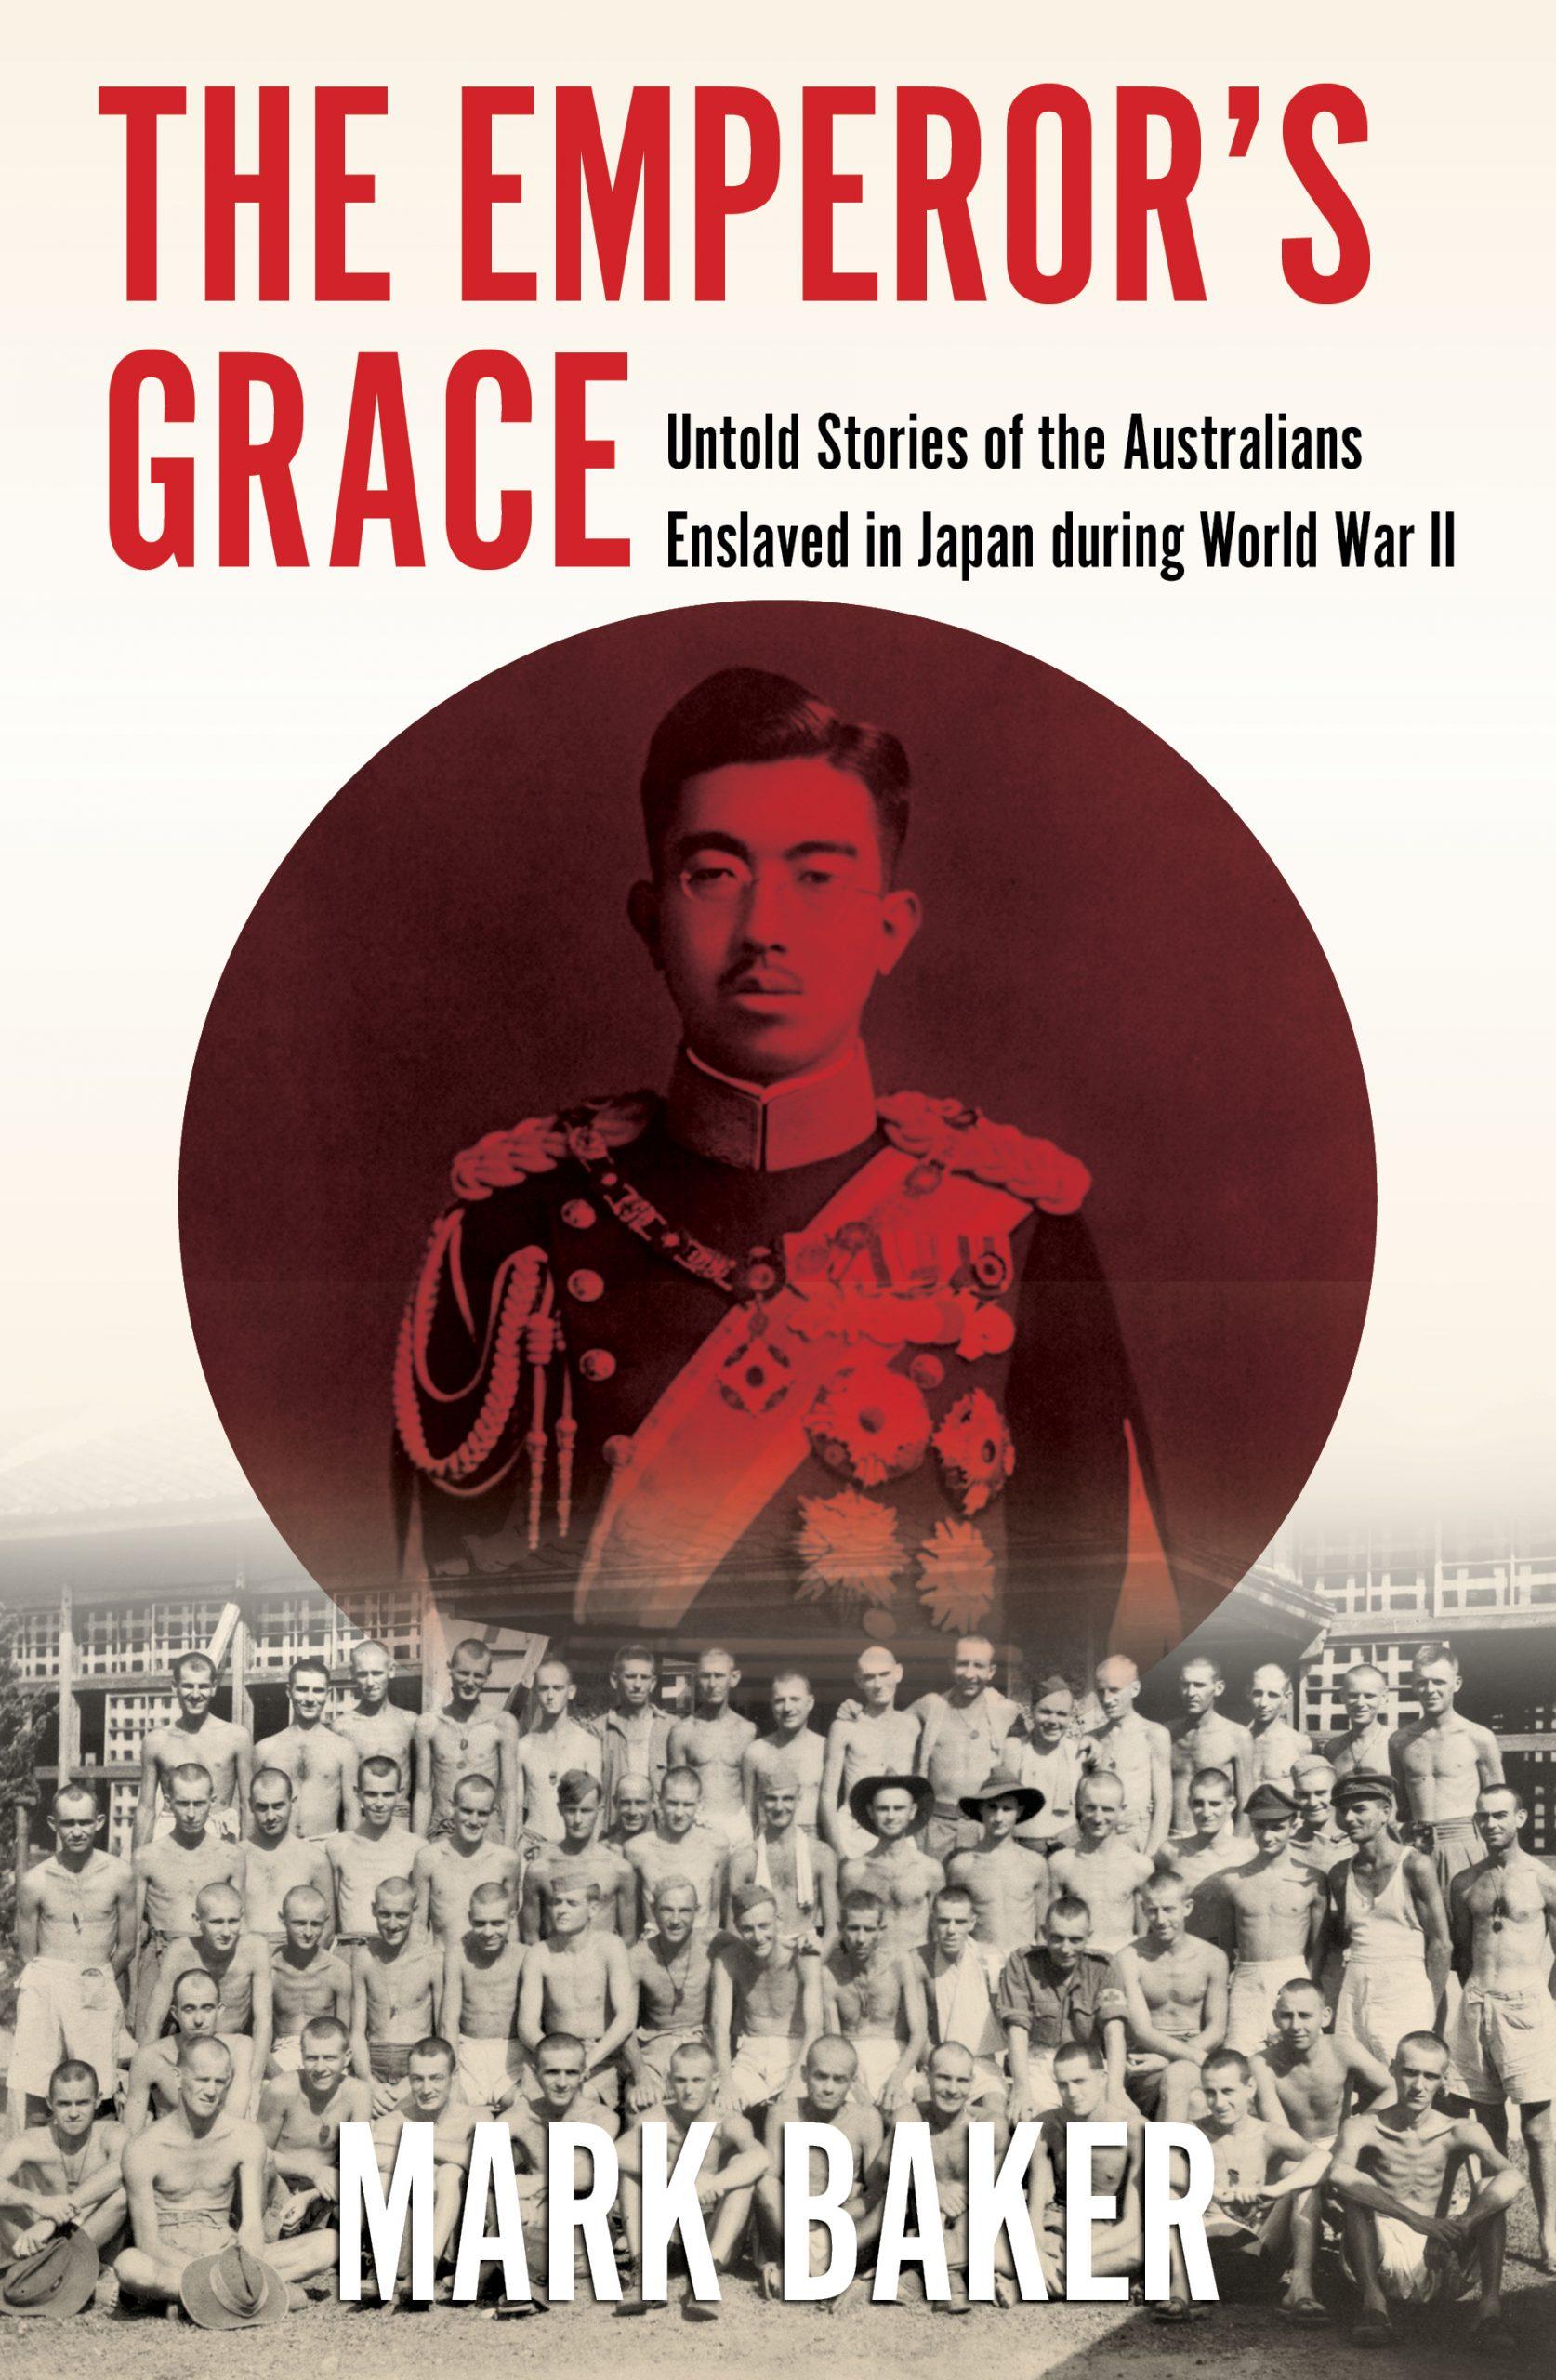 The Emperor's Grace